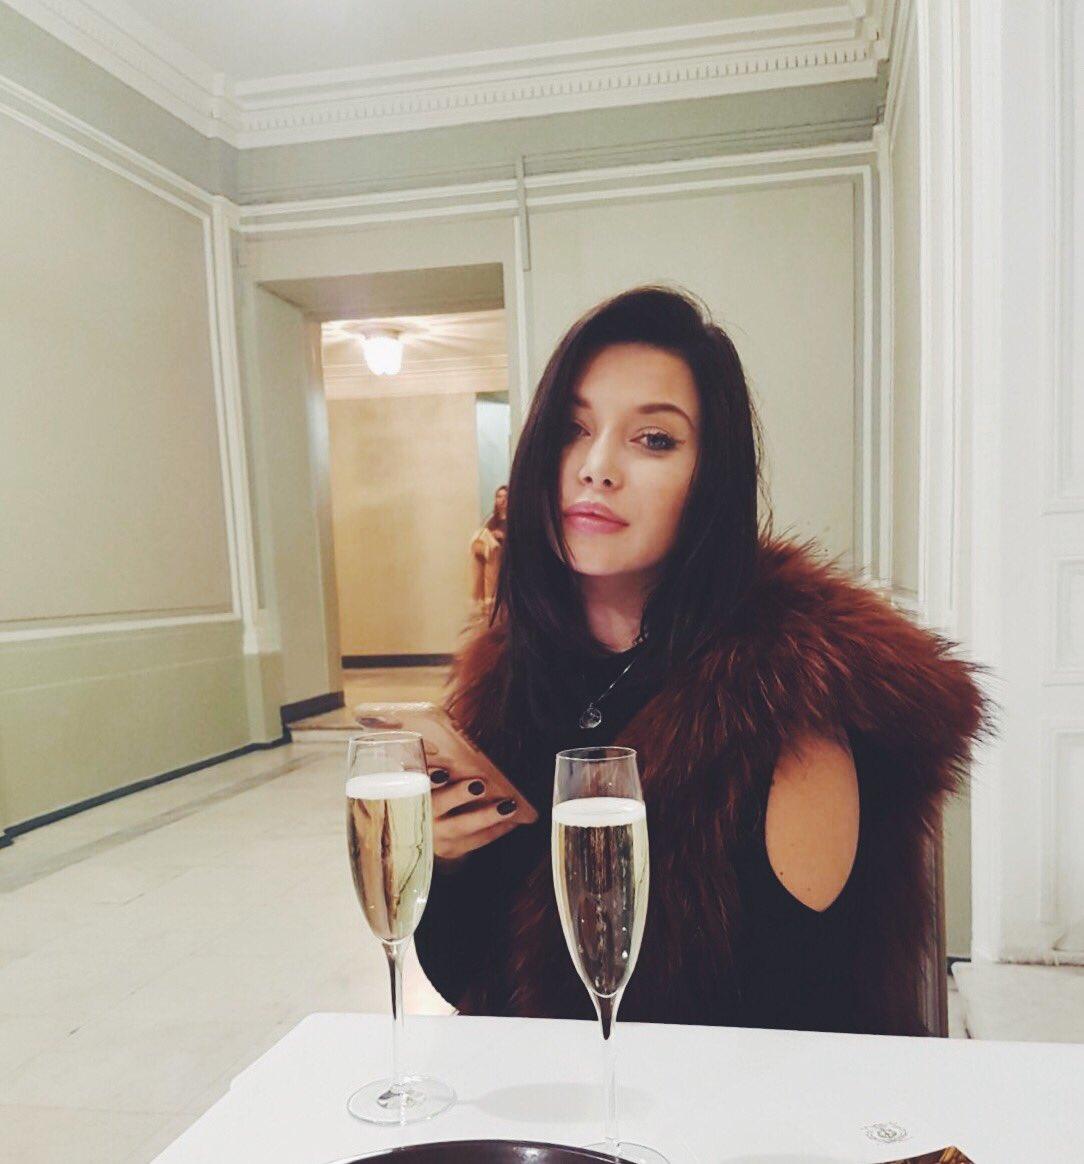 Ballet et champagne 👌 YpCG6KCXjl